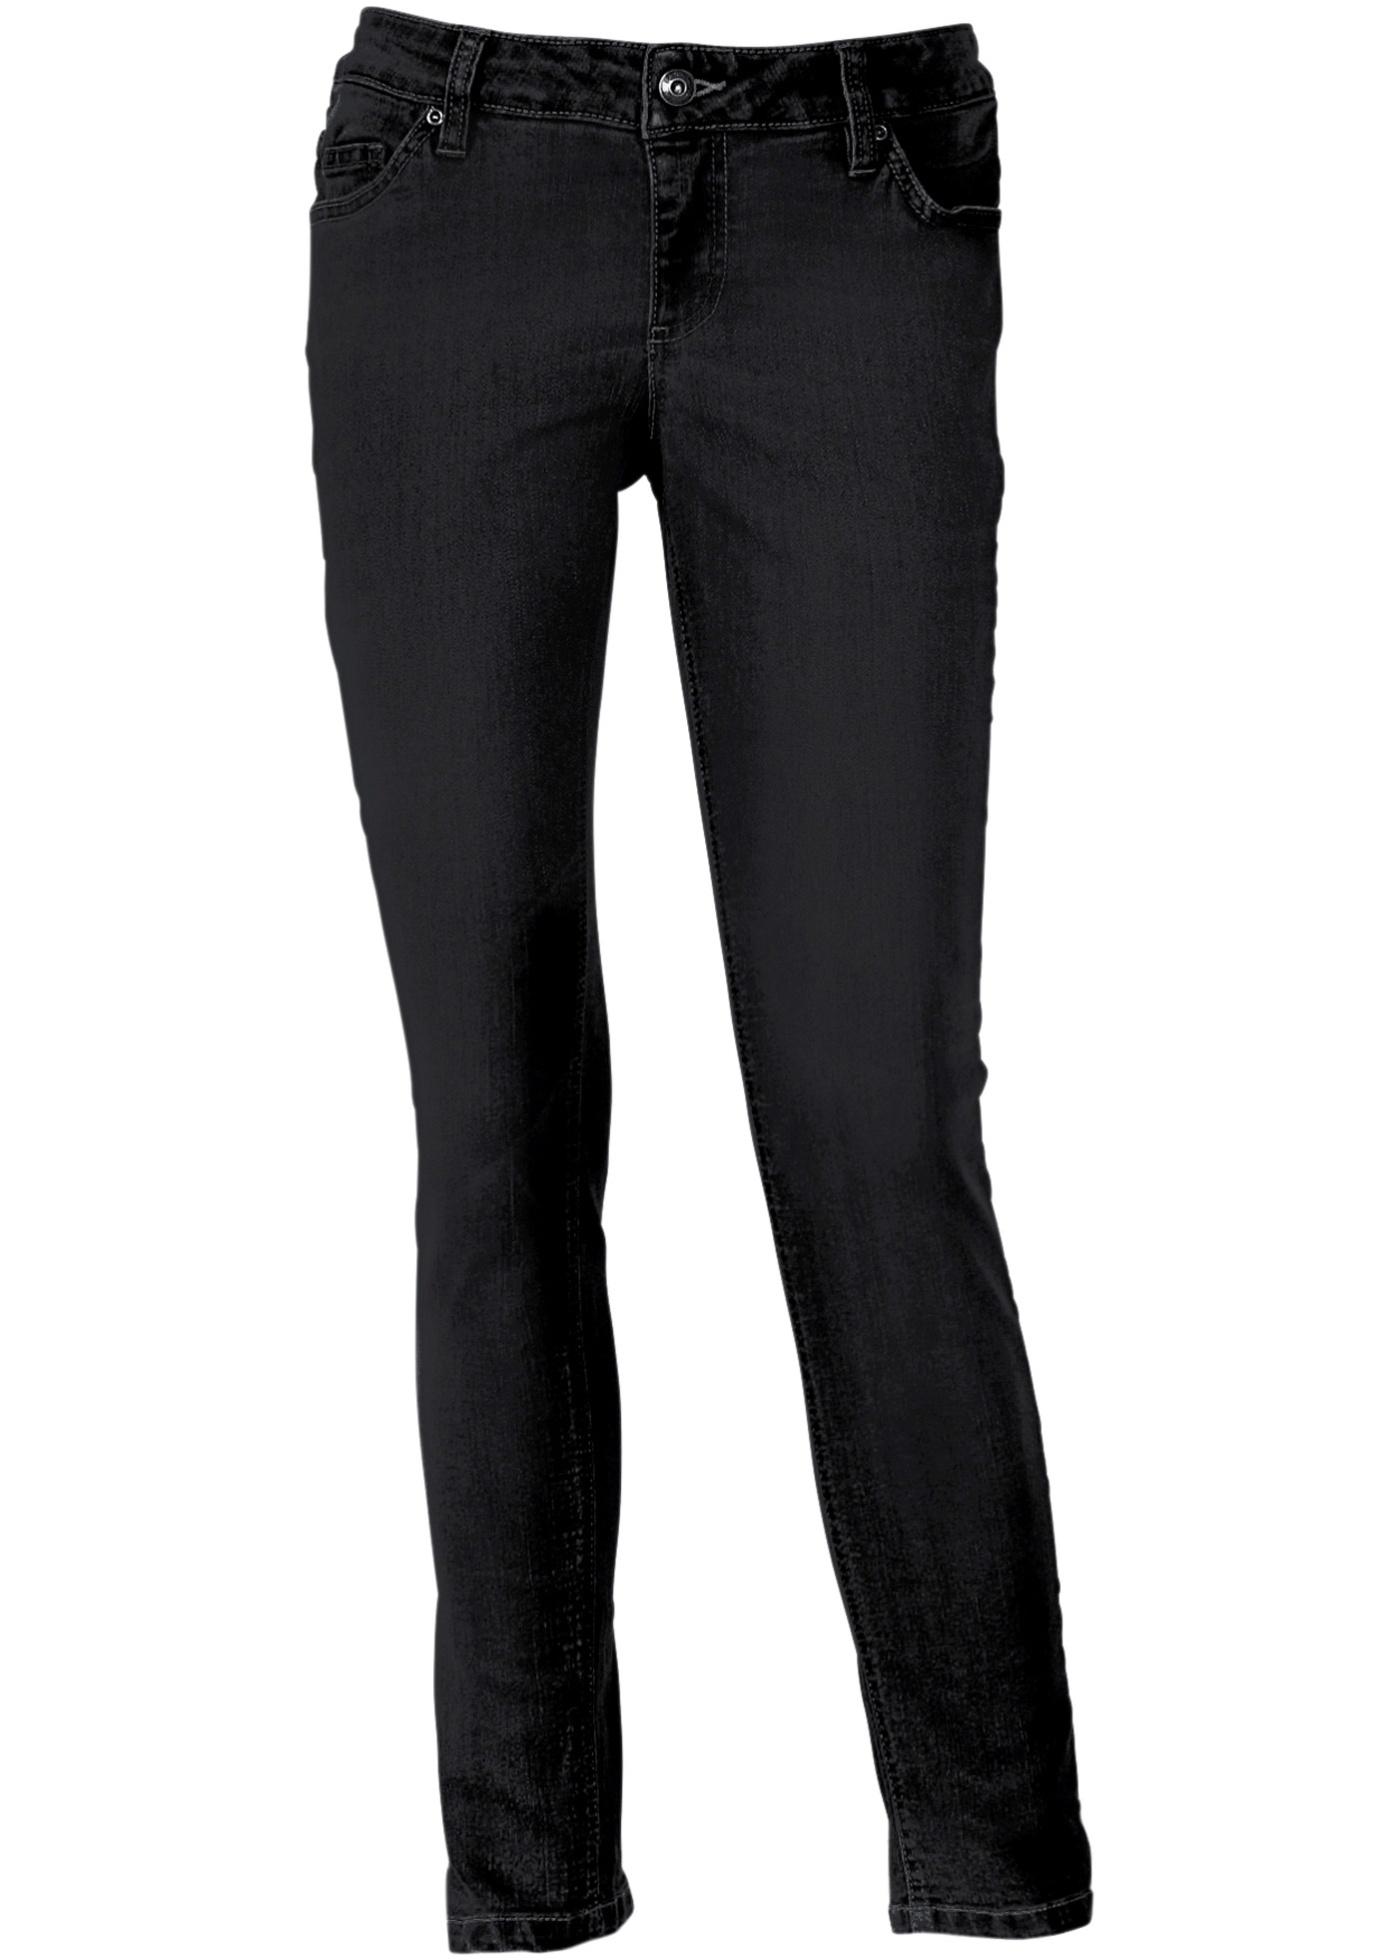 Calça jeans skinny, Tamanho normal preta